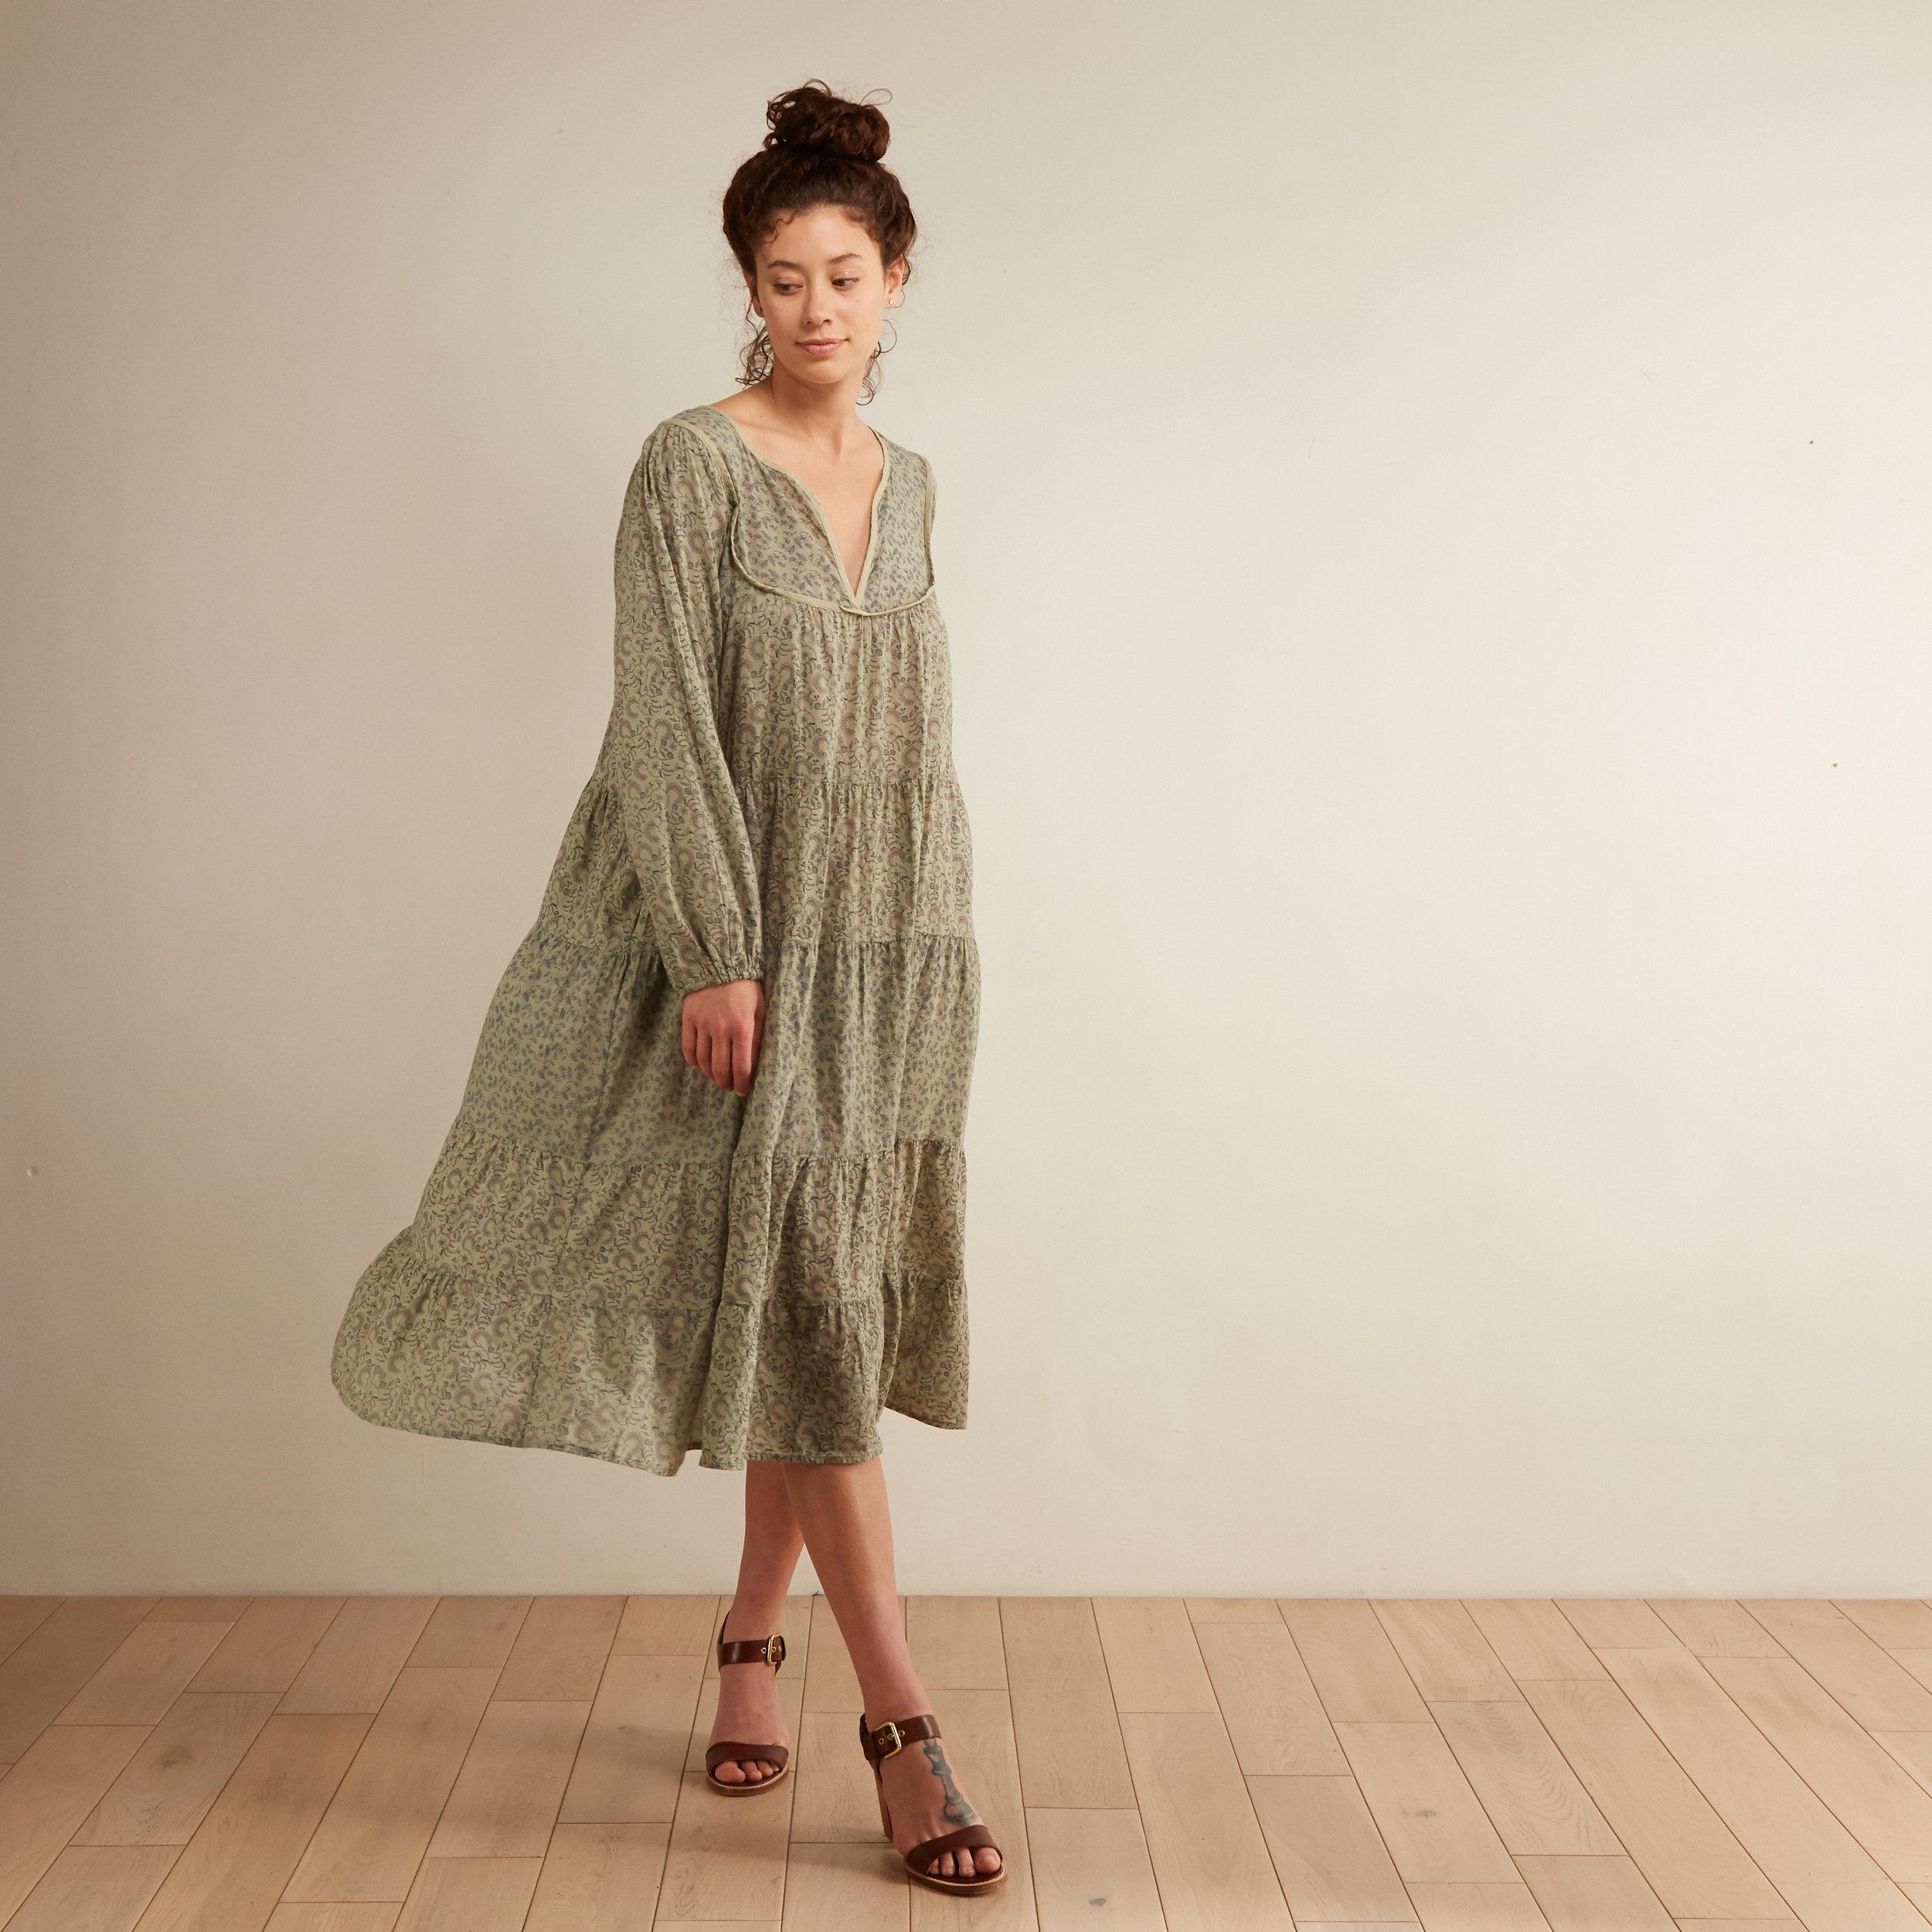 Romantic Vintage Style Dress in Aloe